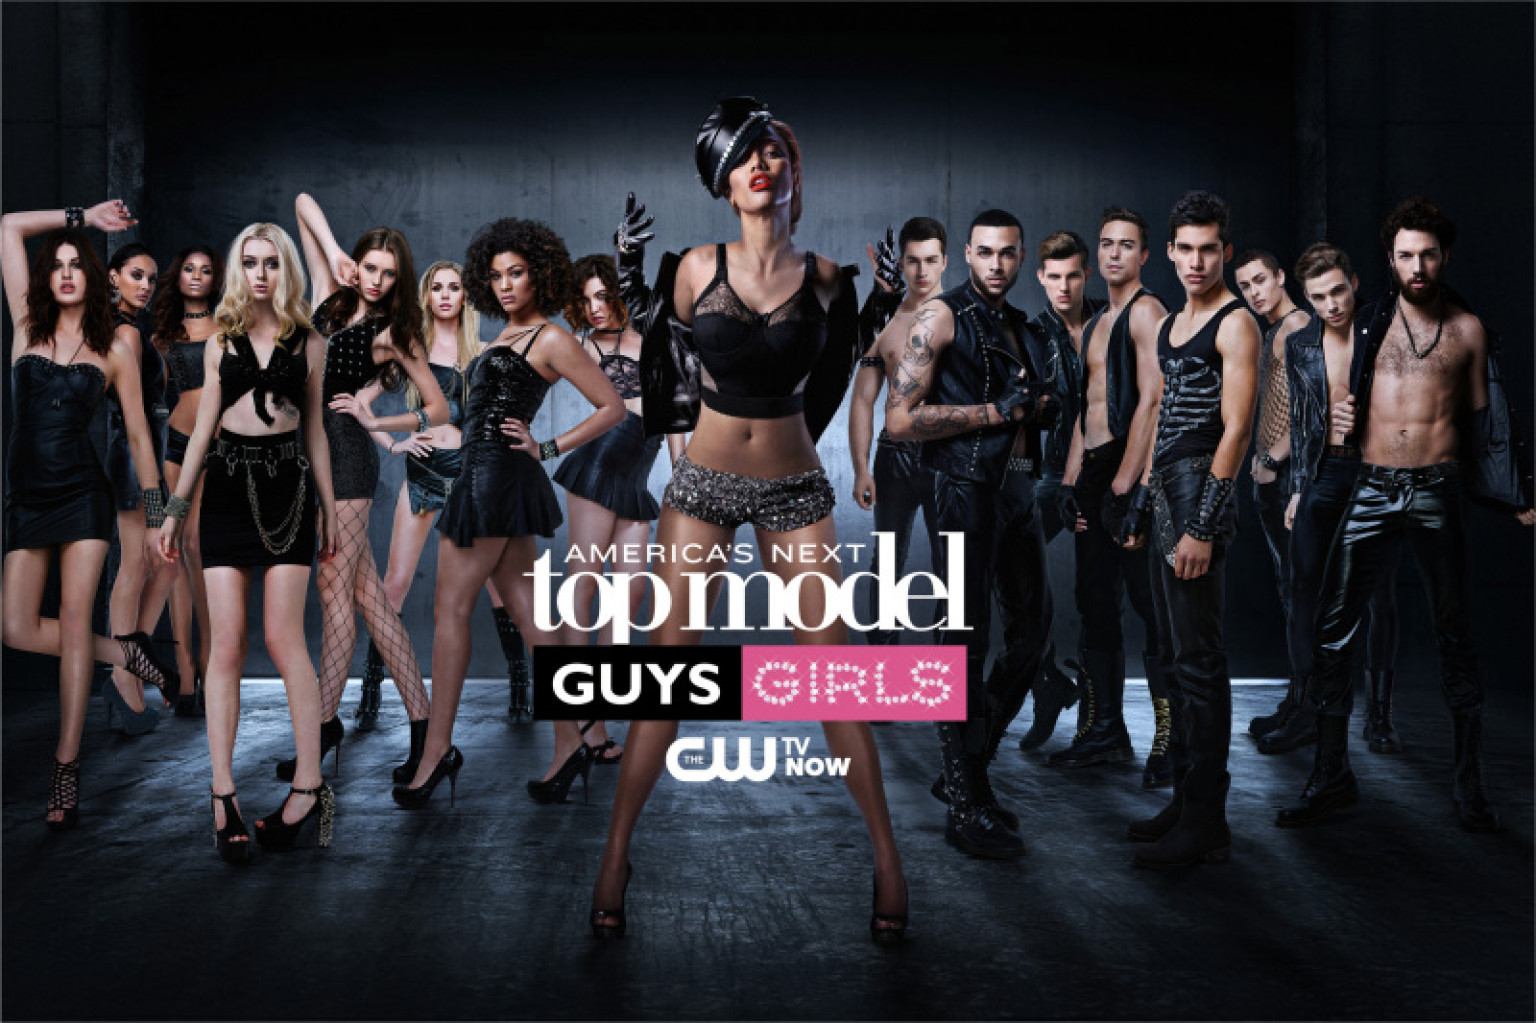 https://i2.wp.com/i.huffpost.com/gen/1255975/thumbs/o-AMERICAS-NEXT-TOP-MODEL-GUYS-AND-GIRLS-facebook.jpg